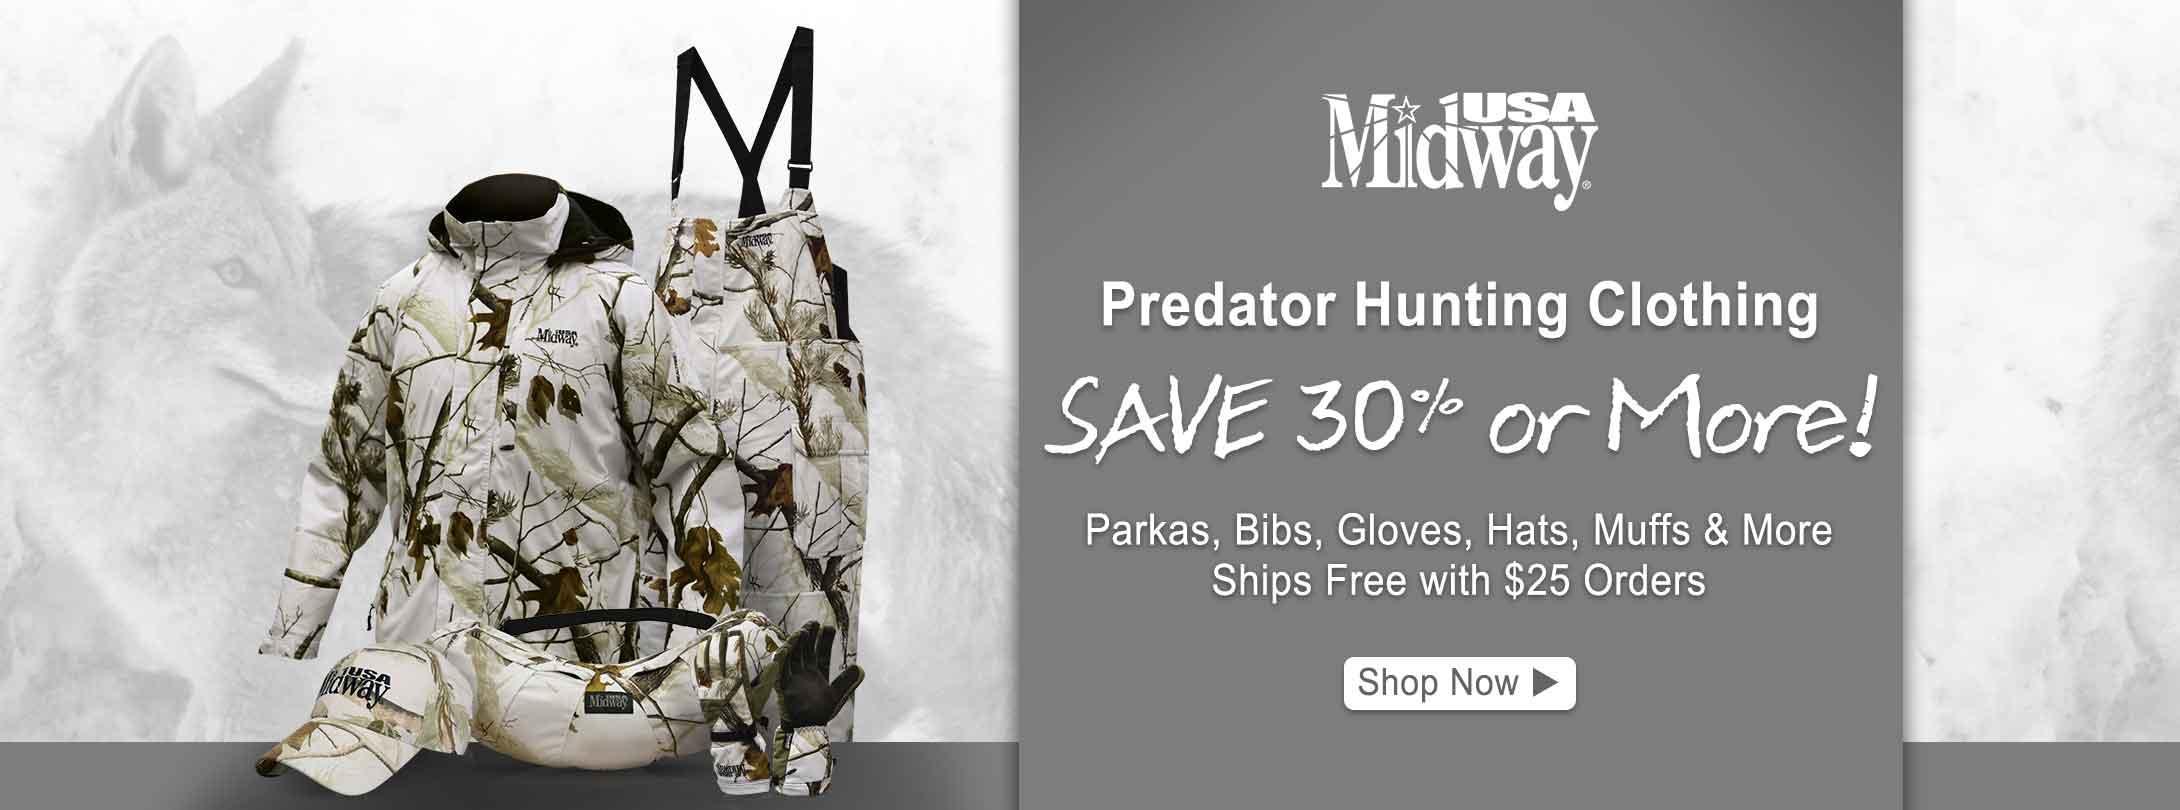 Save 30% or More on MidwayUSA Predator Hunting Clothing